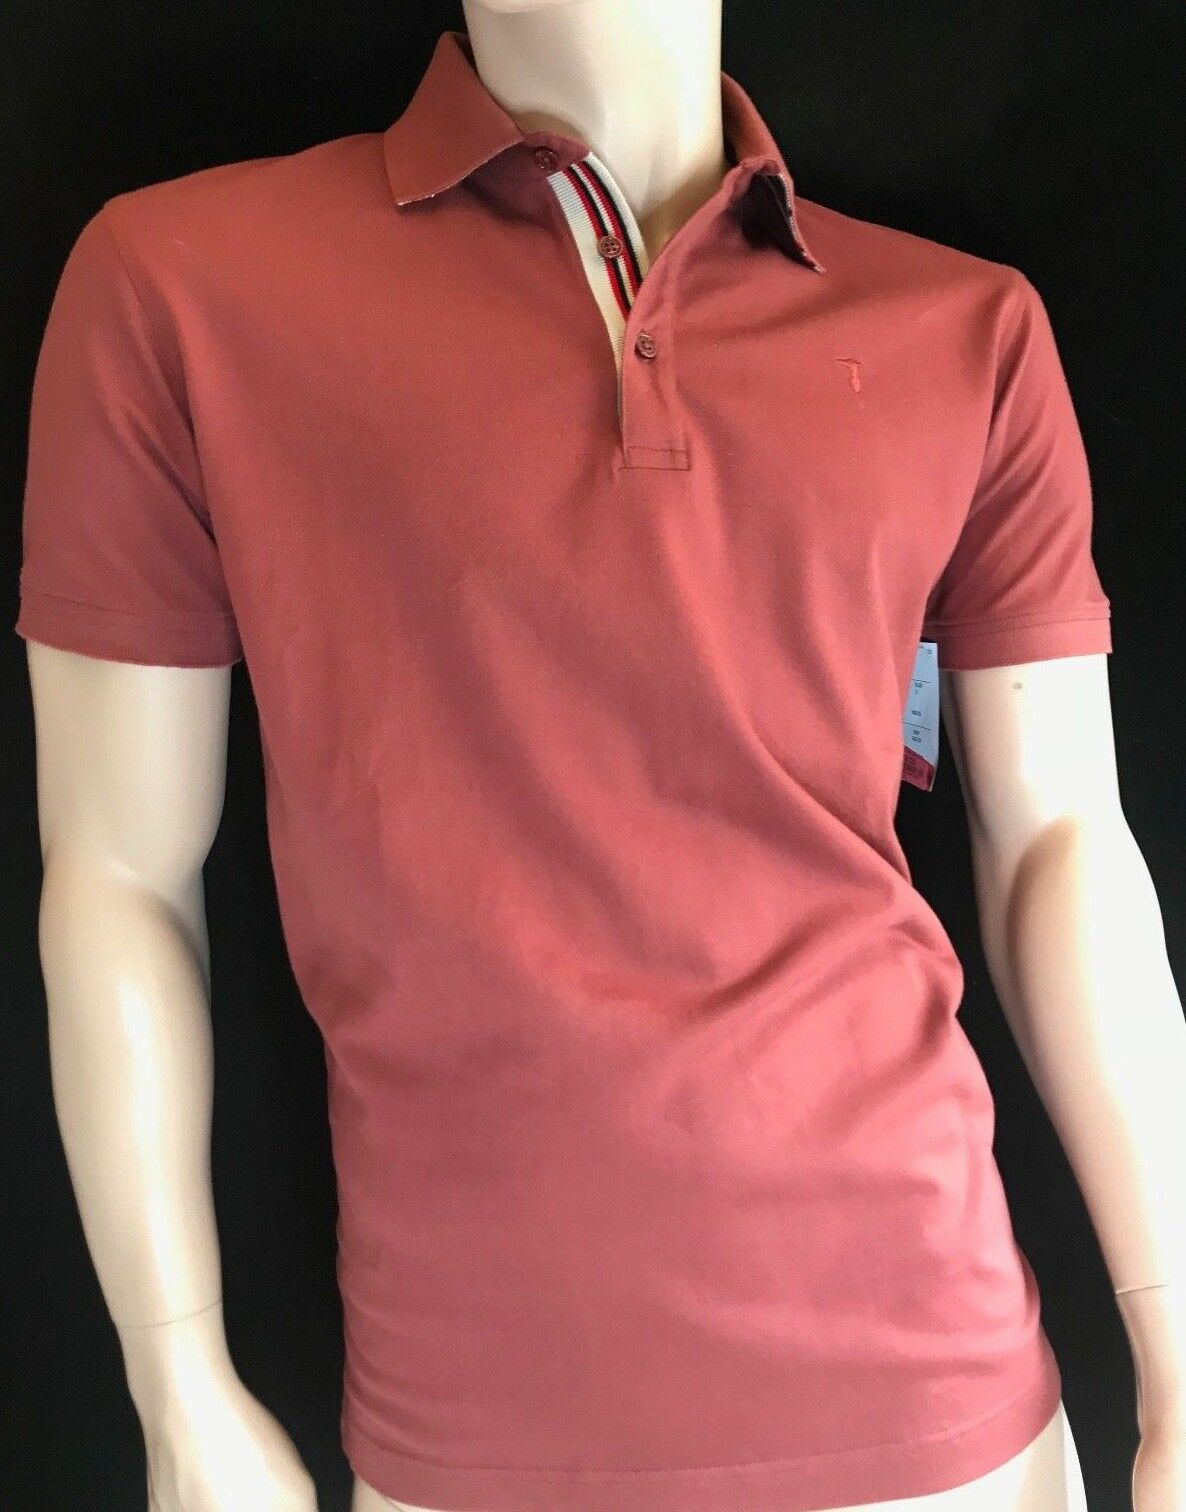 BNWT TRUSSARDI JEANS Polo Close Fit Shirt Größe Chest 42  Length 27.5   | Erlesene Materialien